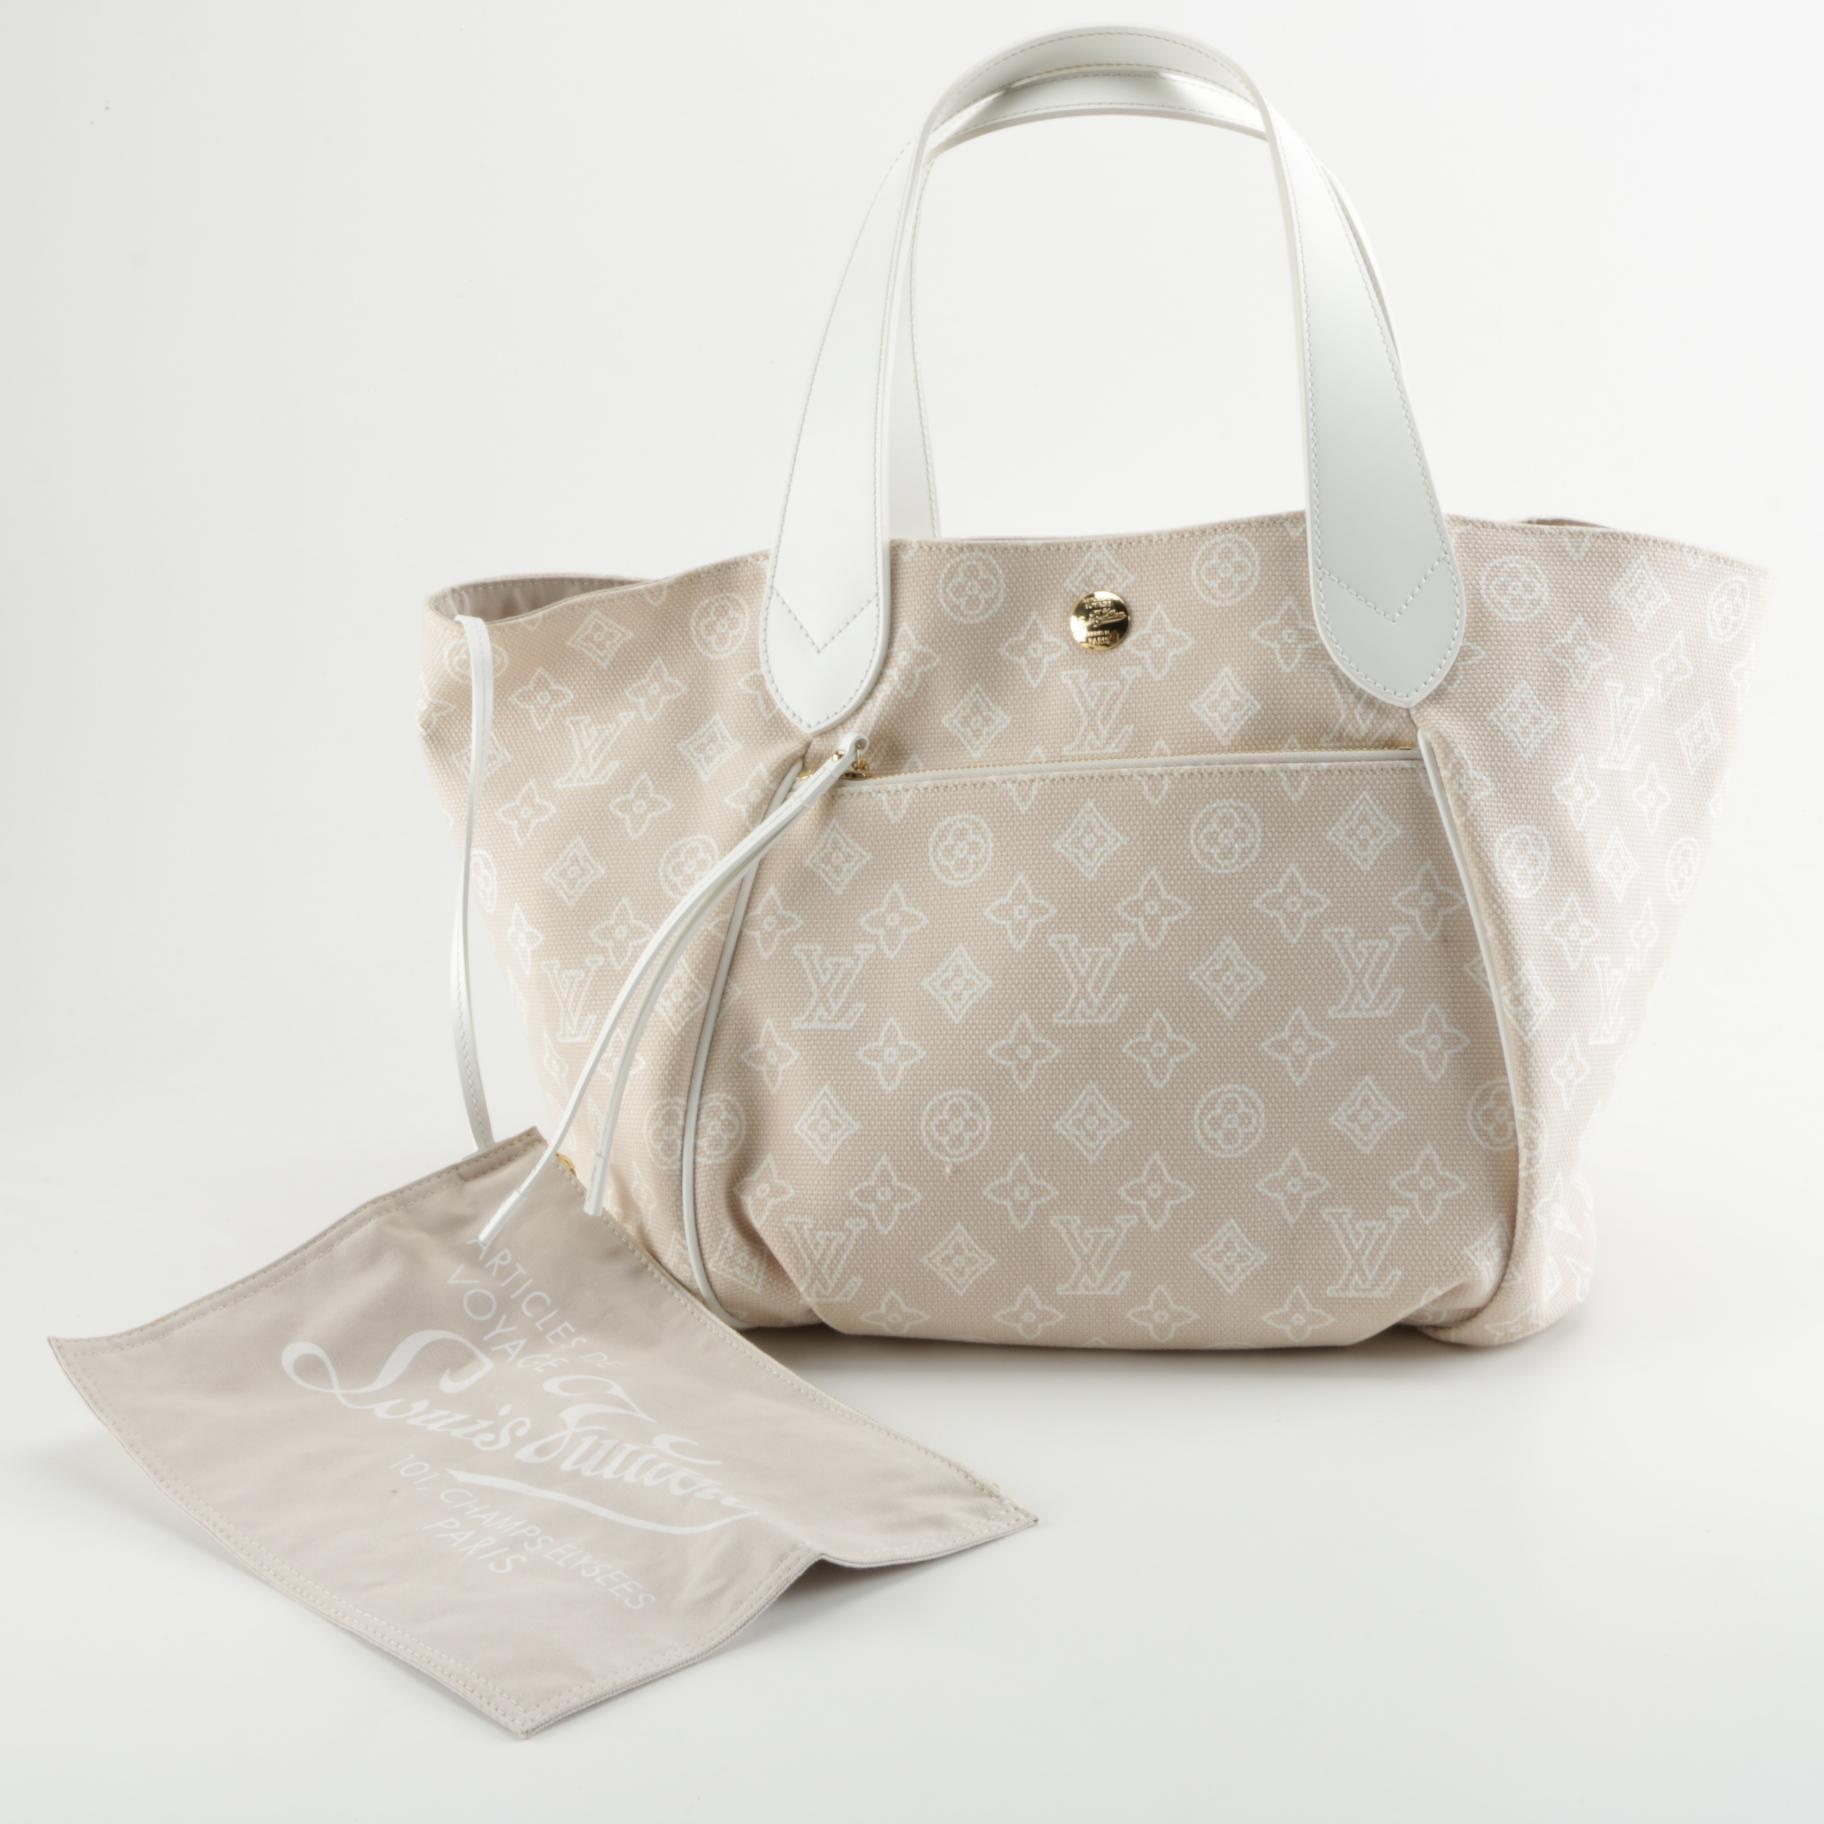 Louis Vuitton Cabas Ipanema PM Tote